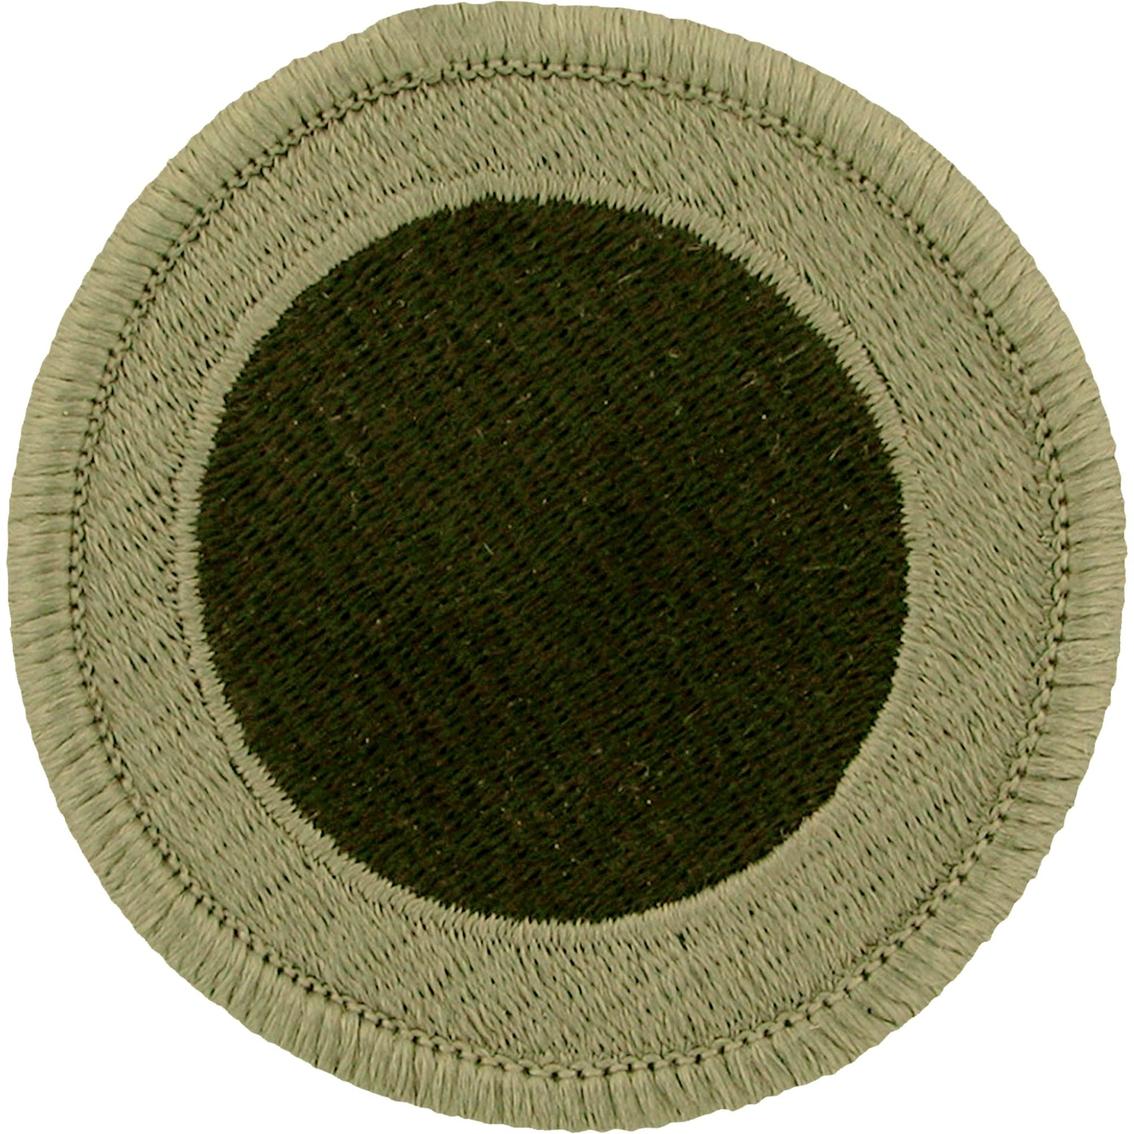 Army Unit Patch 37th Infantry Brigade Combat Team (ocp